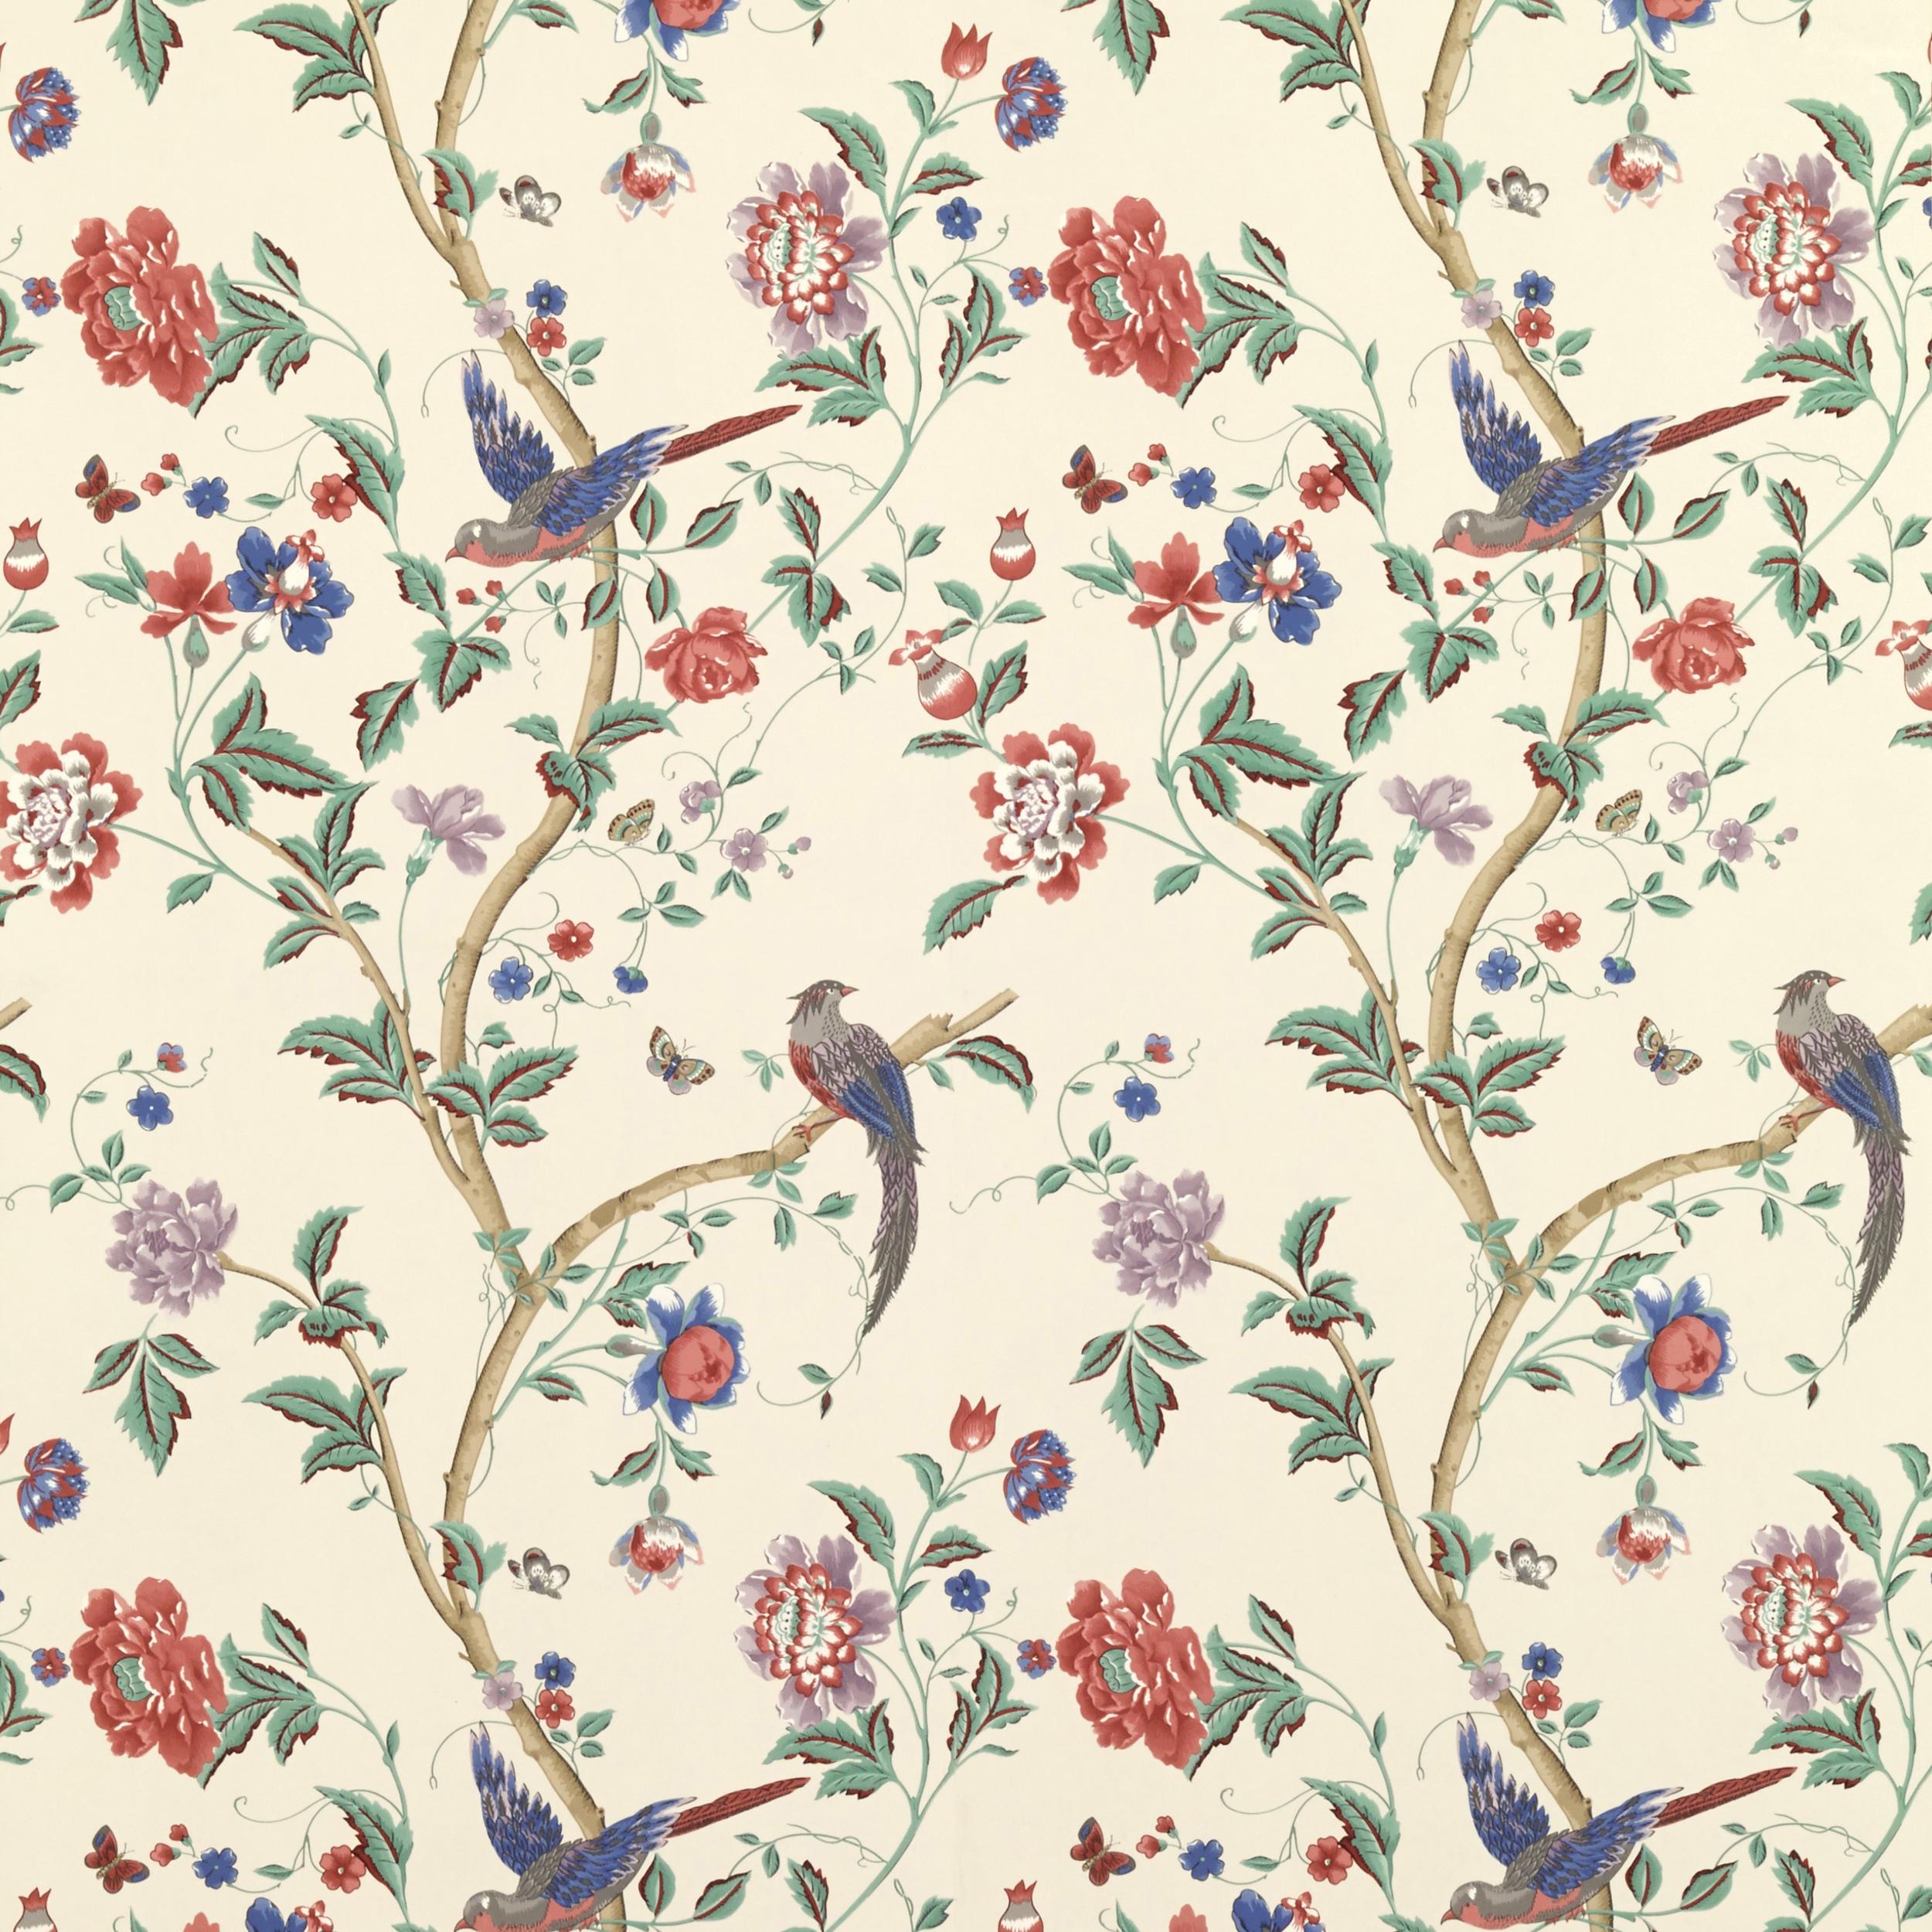 laura ashley summer palace wallpaper wallpapersafari. Black Bedroom Furniture Sets. Home Design Ideas